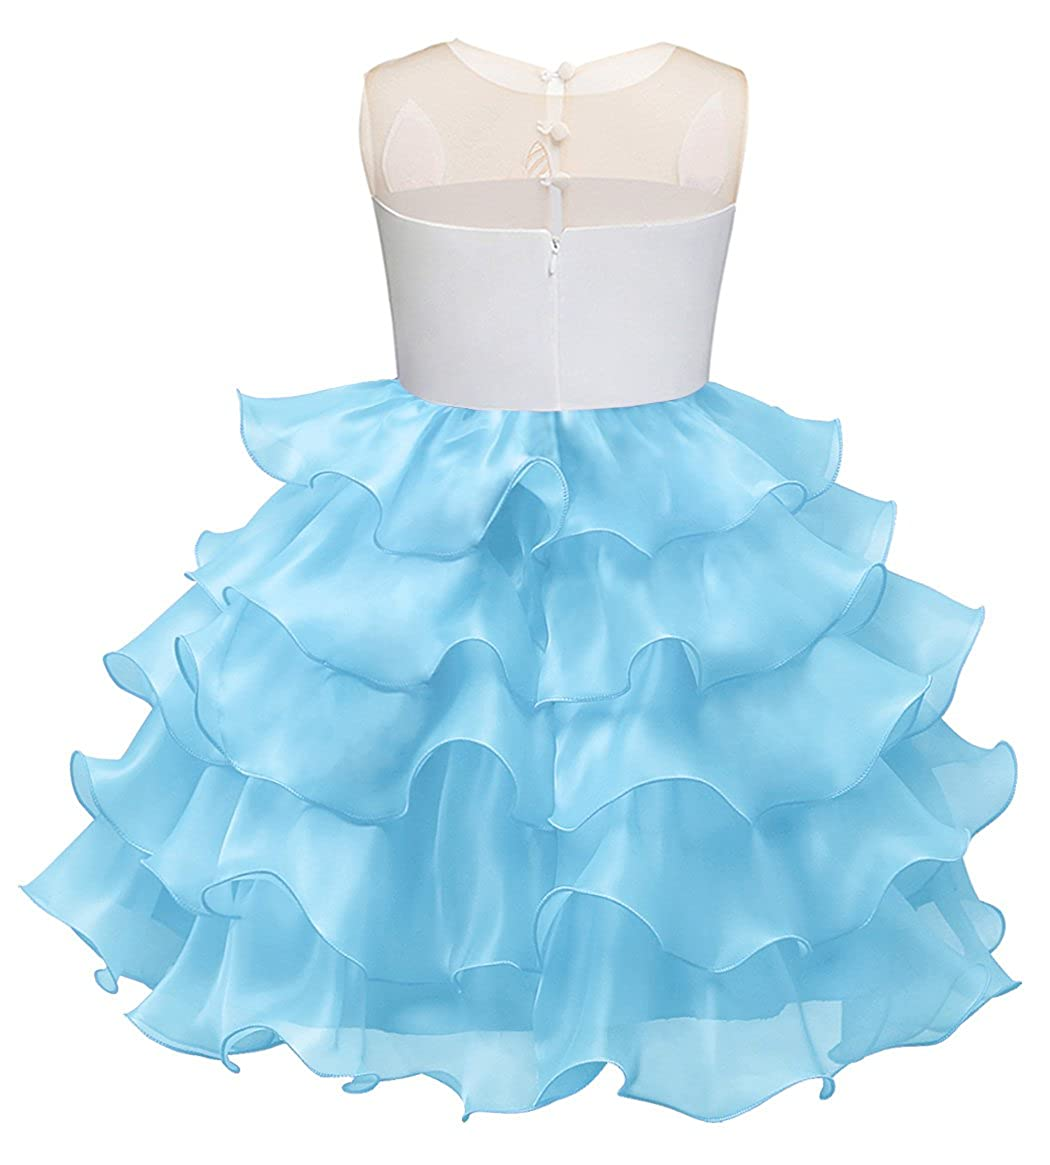 AmzBarley Girls Unicorn Dress Princess Costume Tulle Flower Cosplay Party